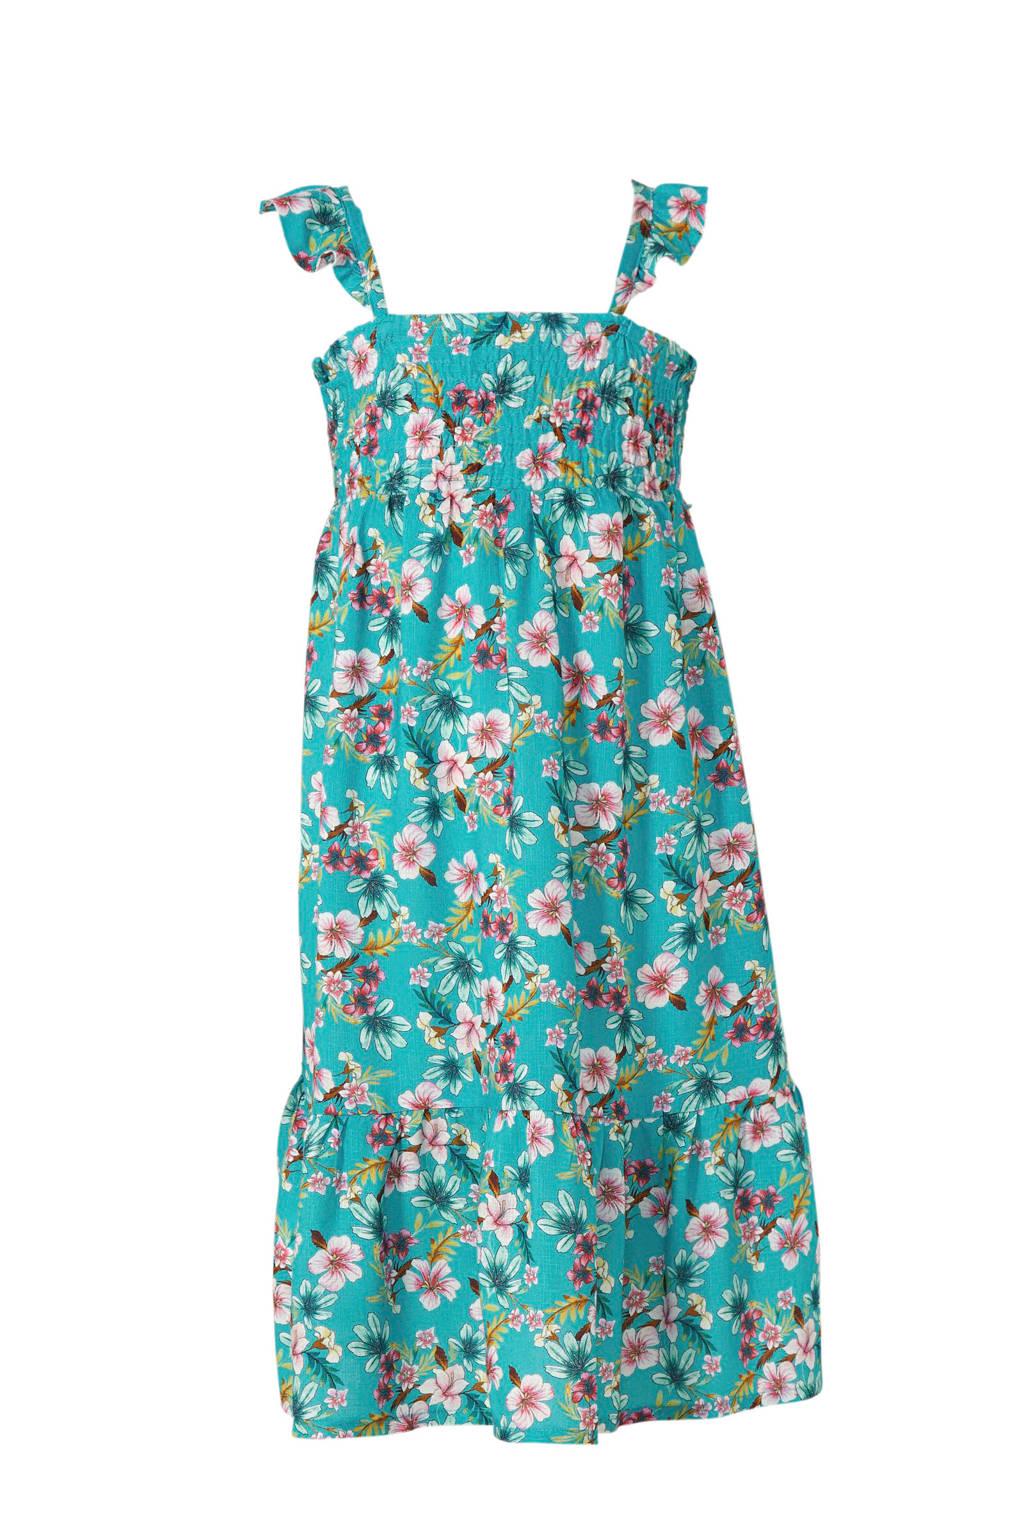 Mango Kids gebloemde jurk turquoise, Turquoise